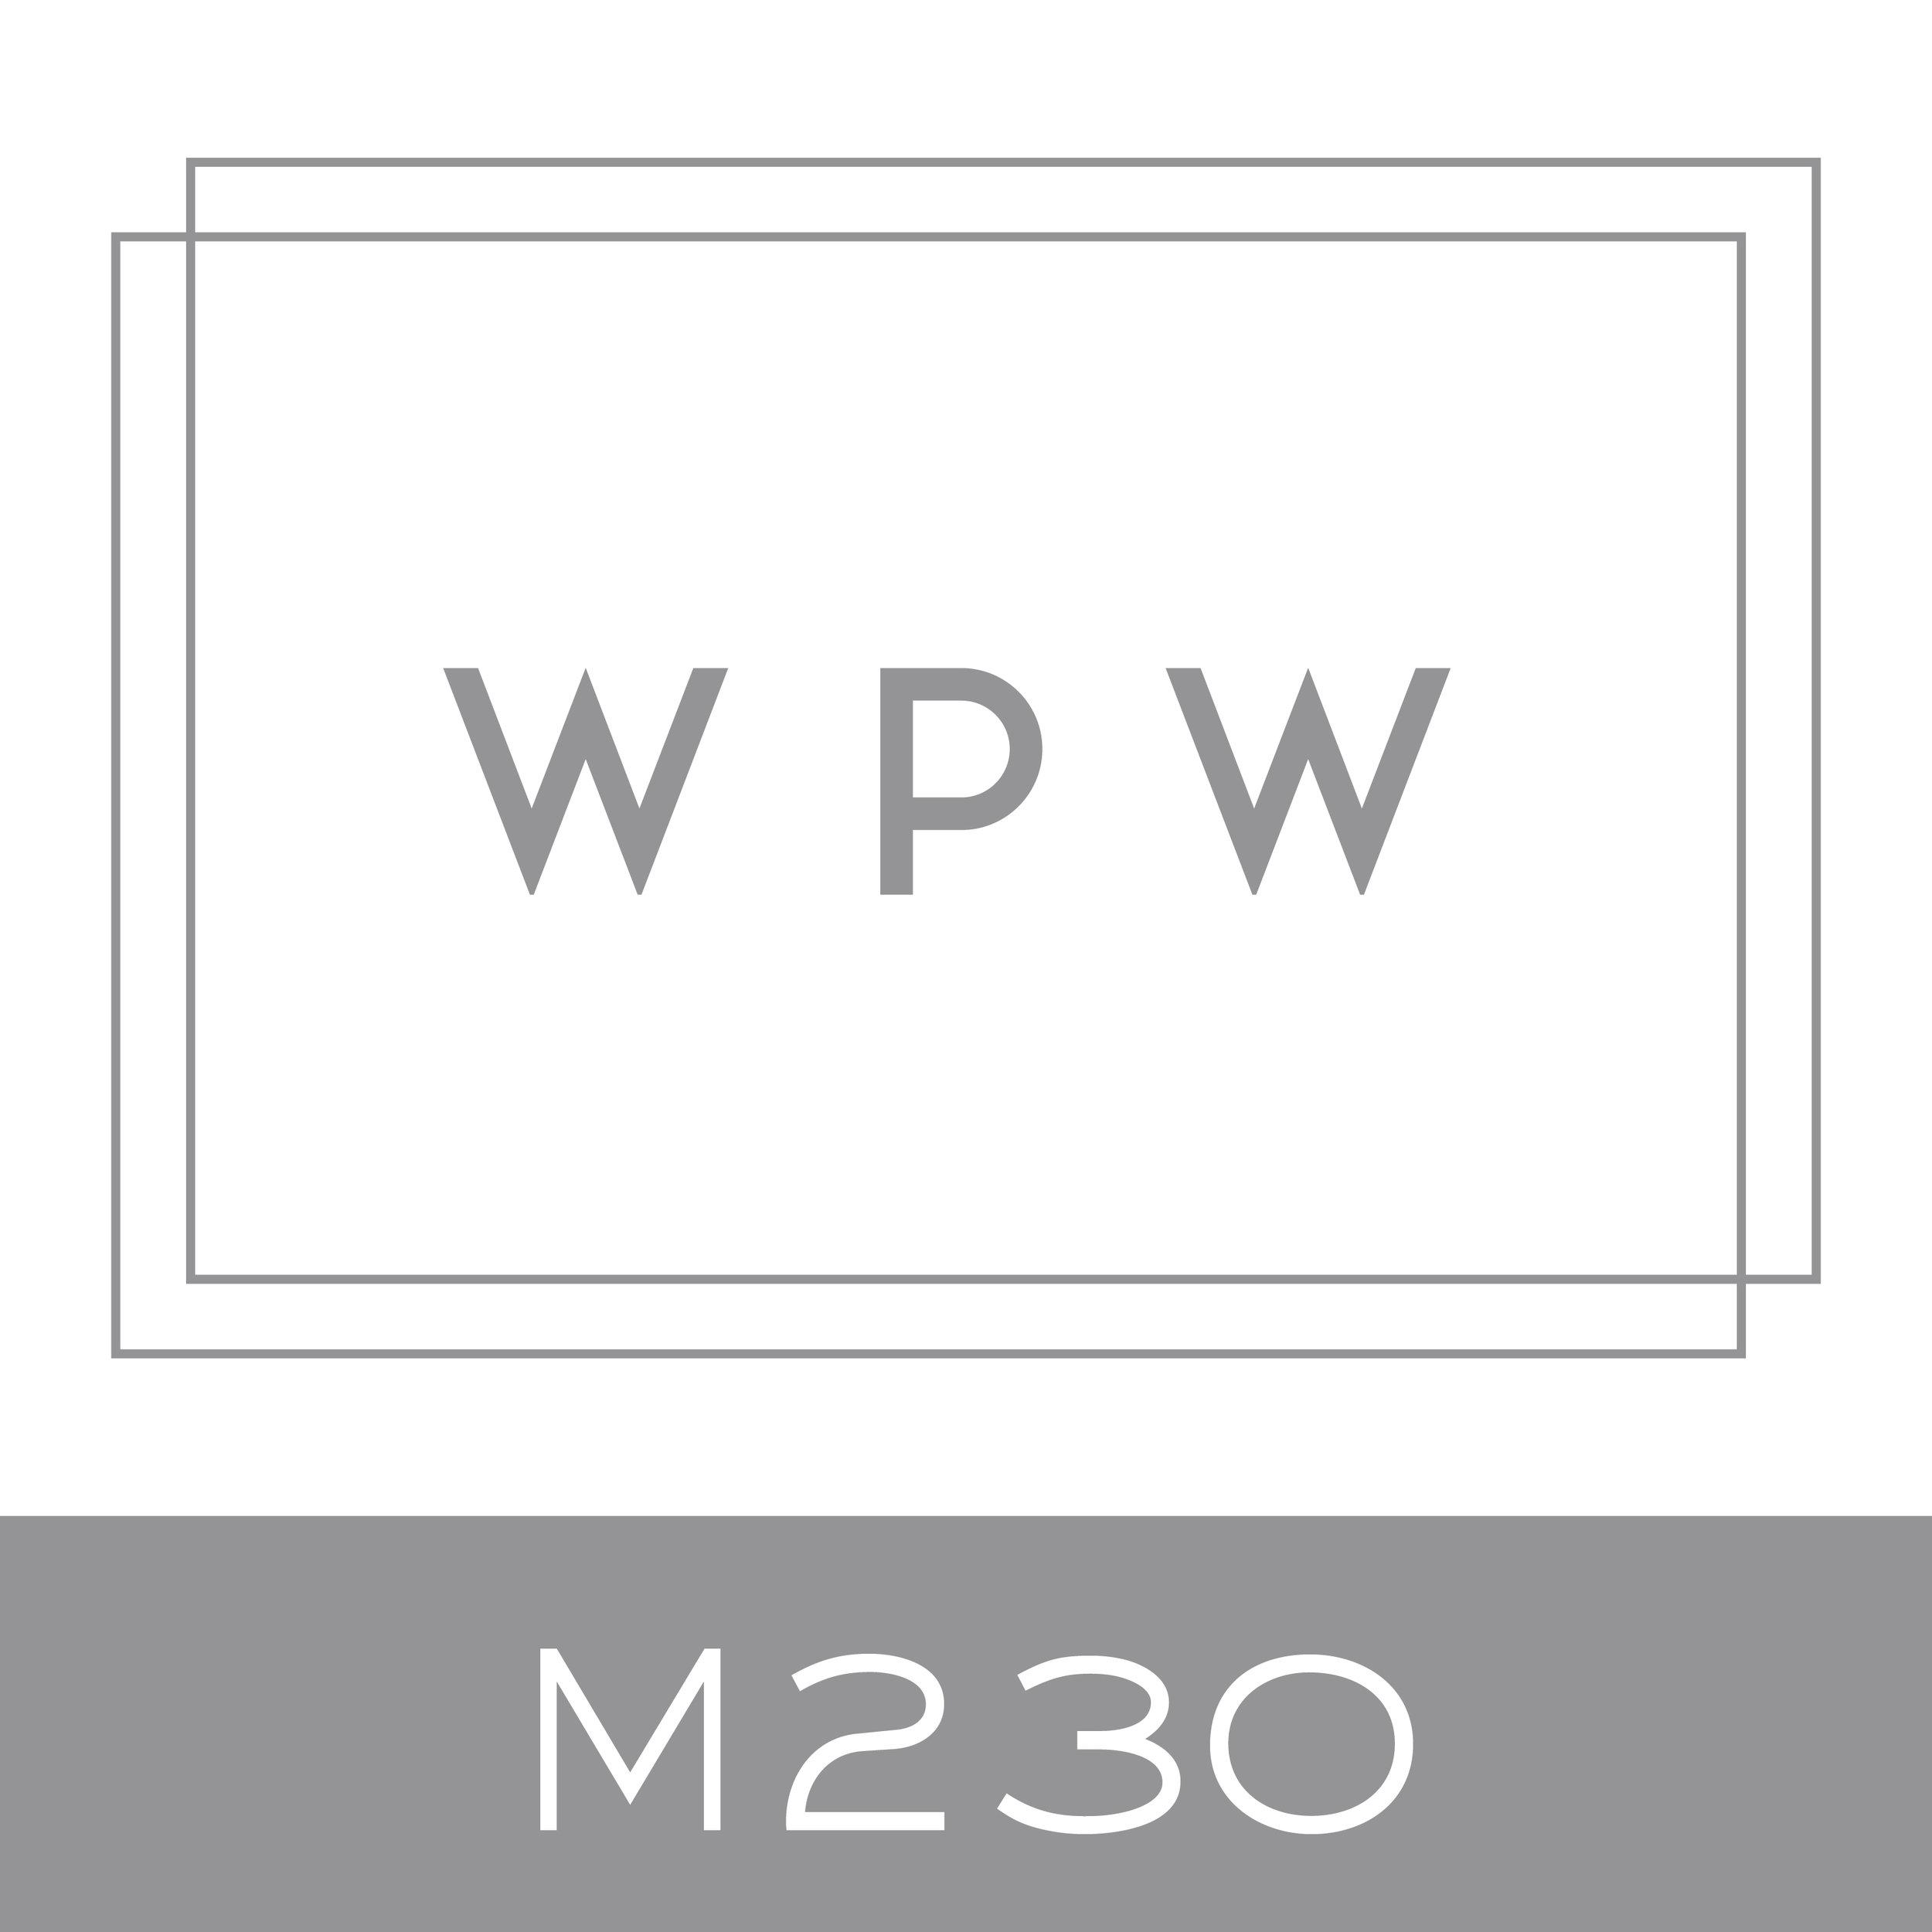 M230.jpg